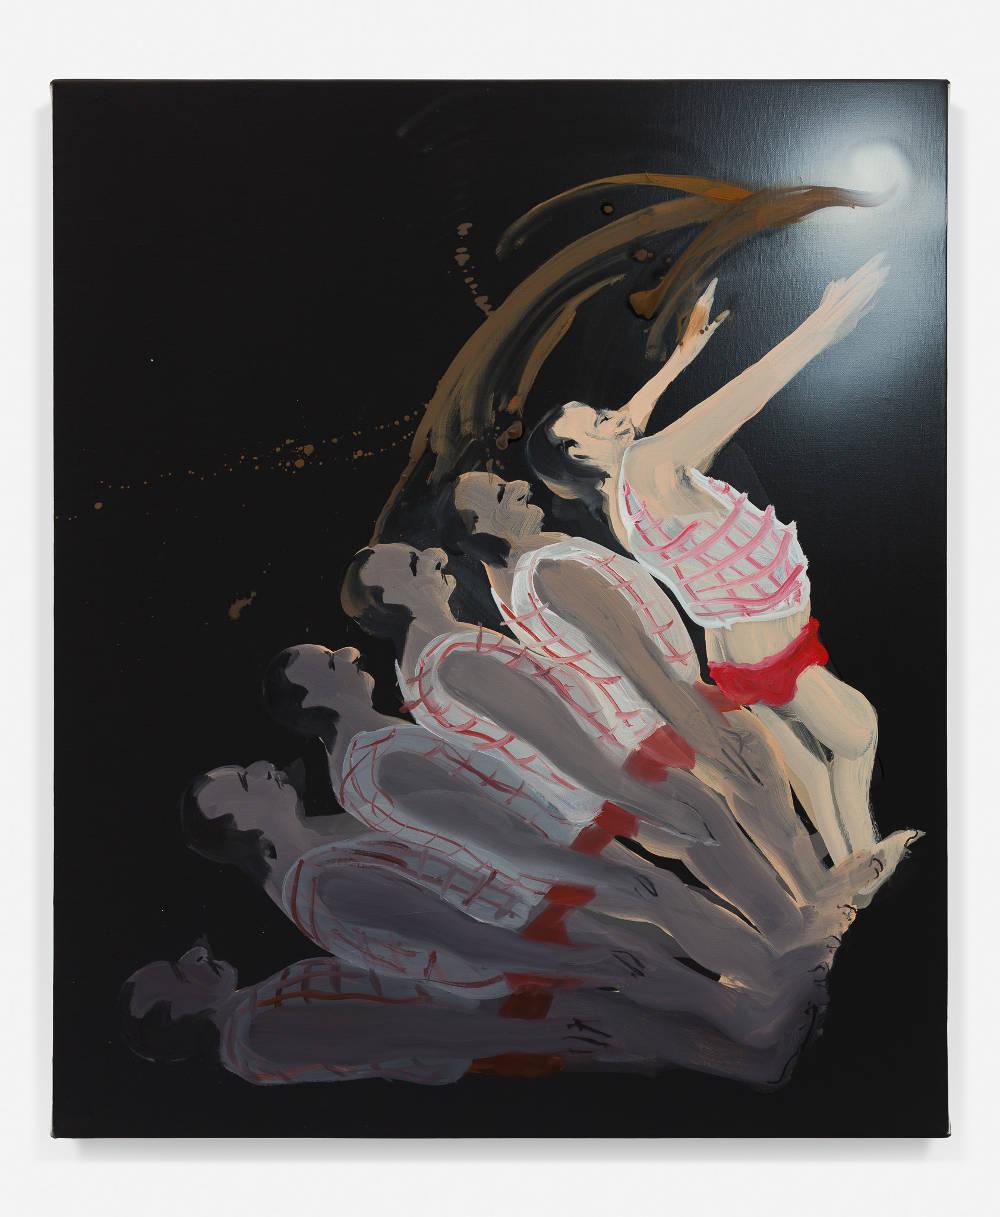 Tala Madani, The Ascendant, 2018. Oil on linen 20 x 17 inches (50.8 x 43.2 cm) © Tala Madani, courtesy 303 Gallery, New York